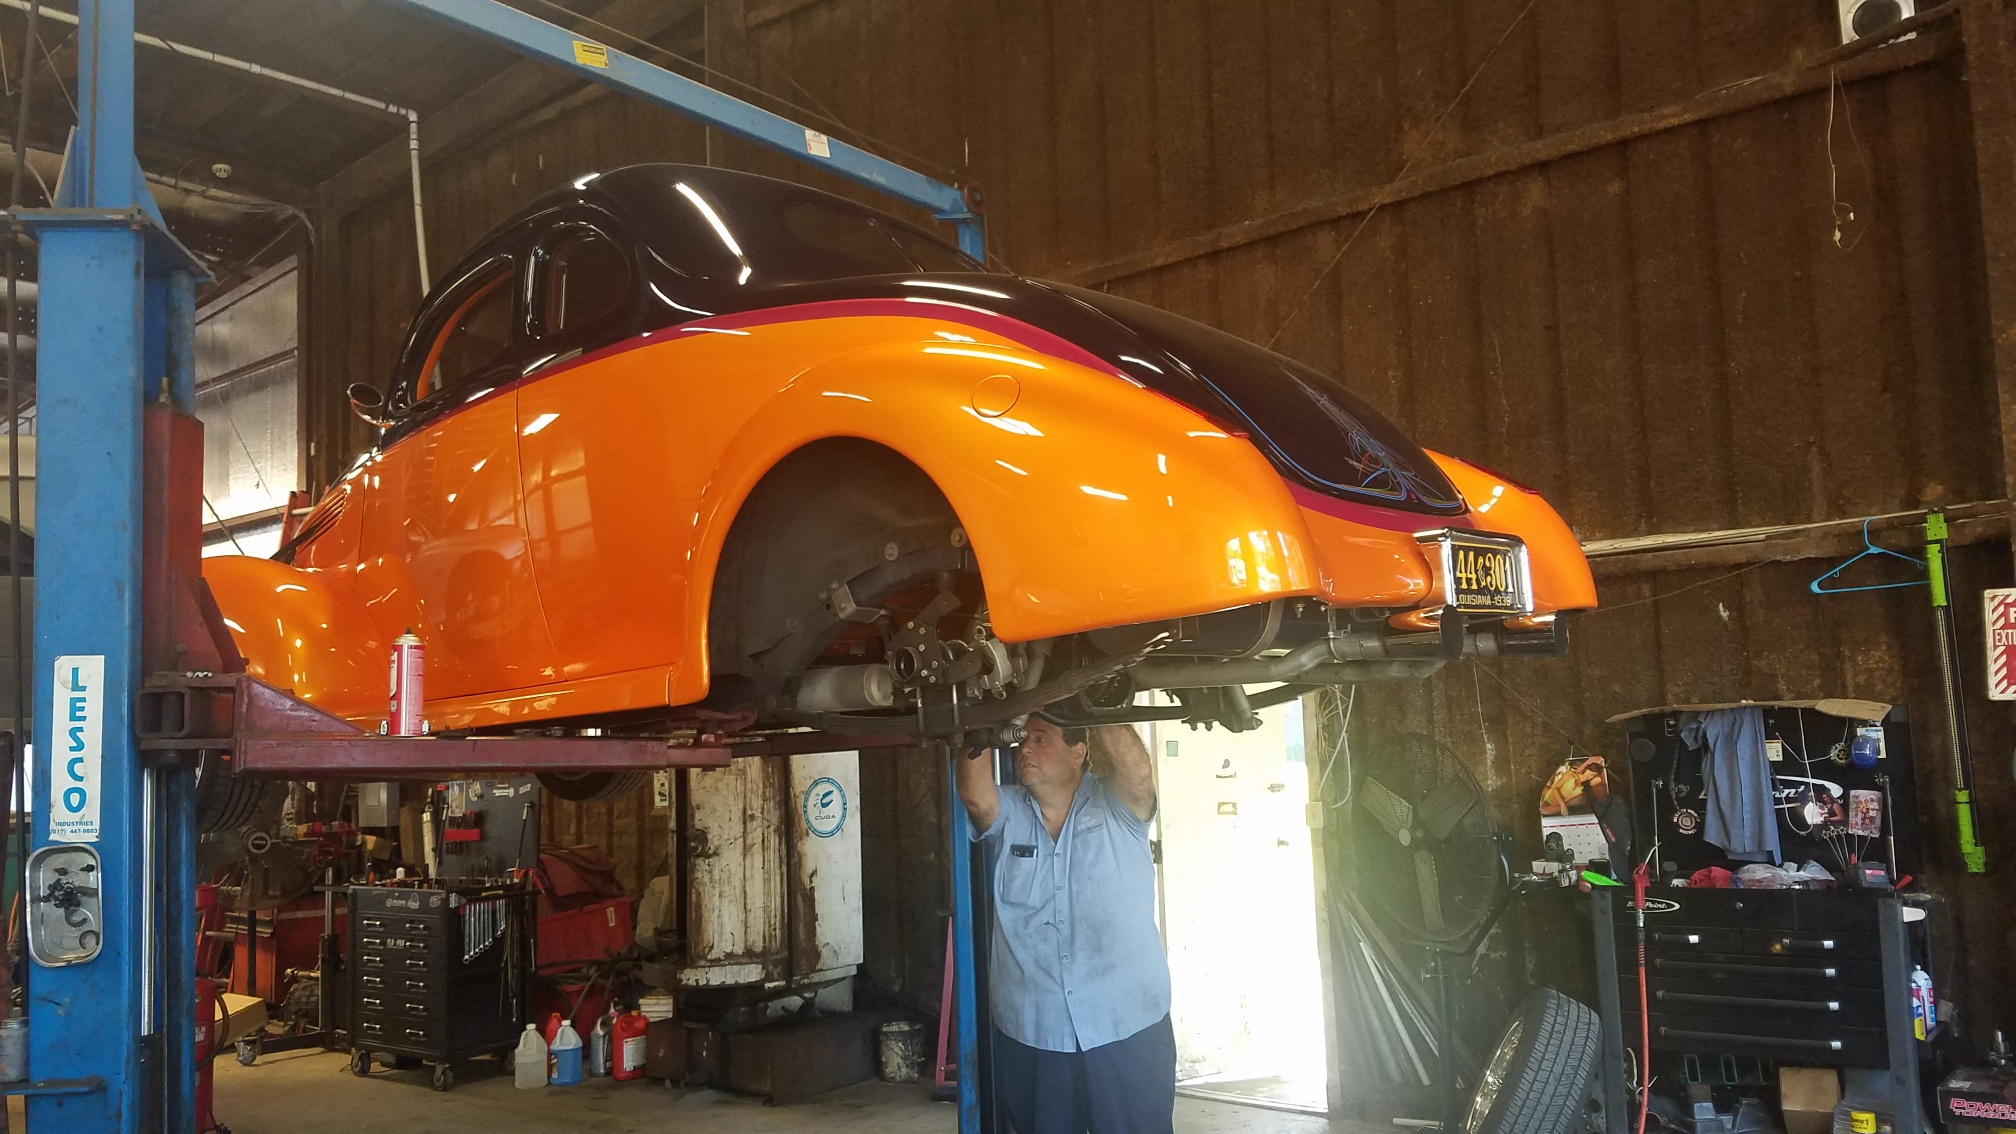 Dale's Auto Repair services classic's